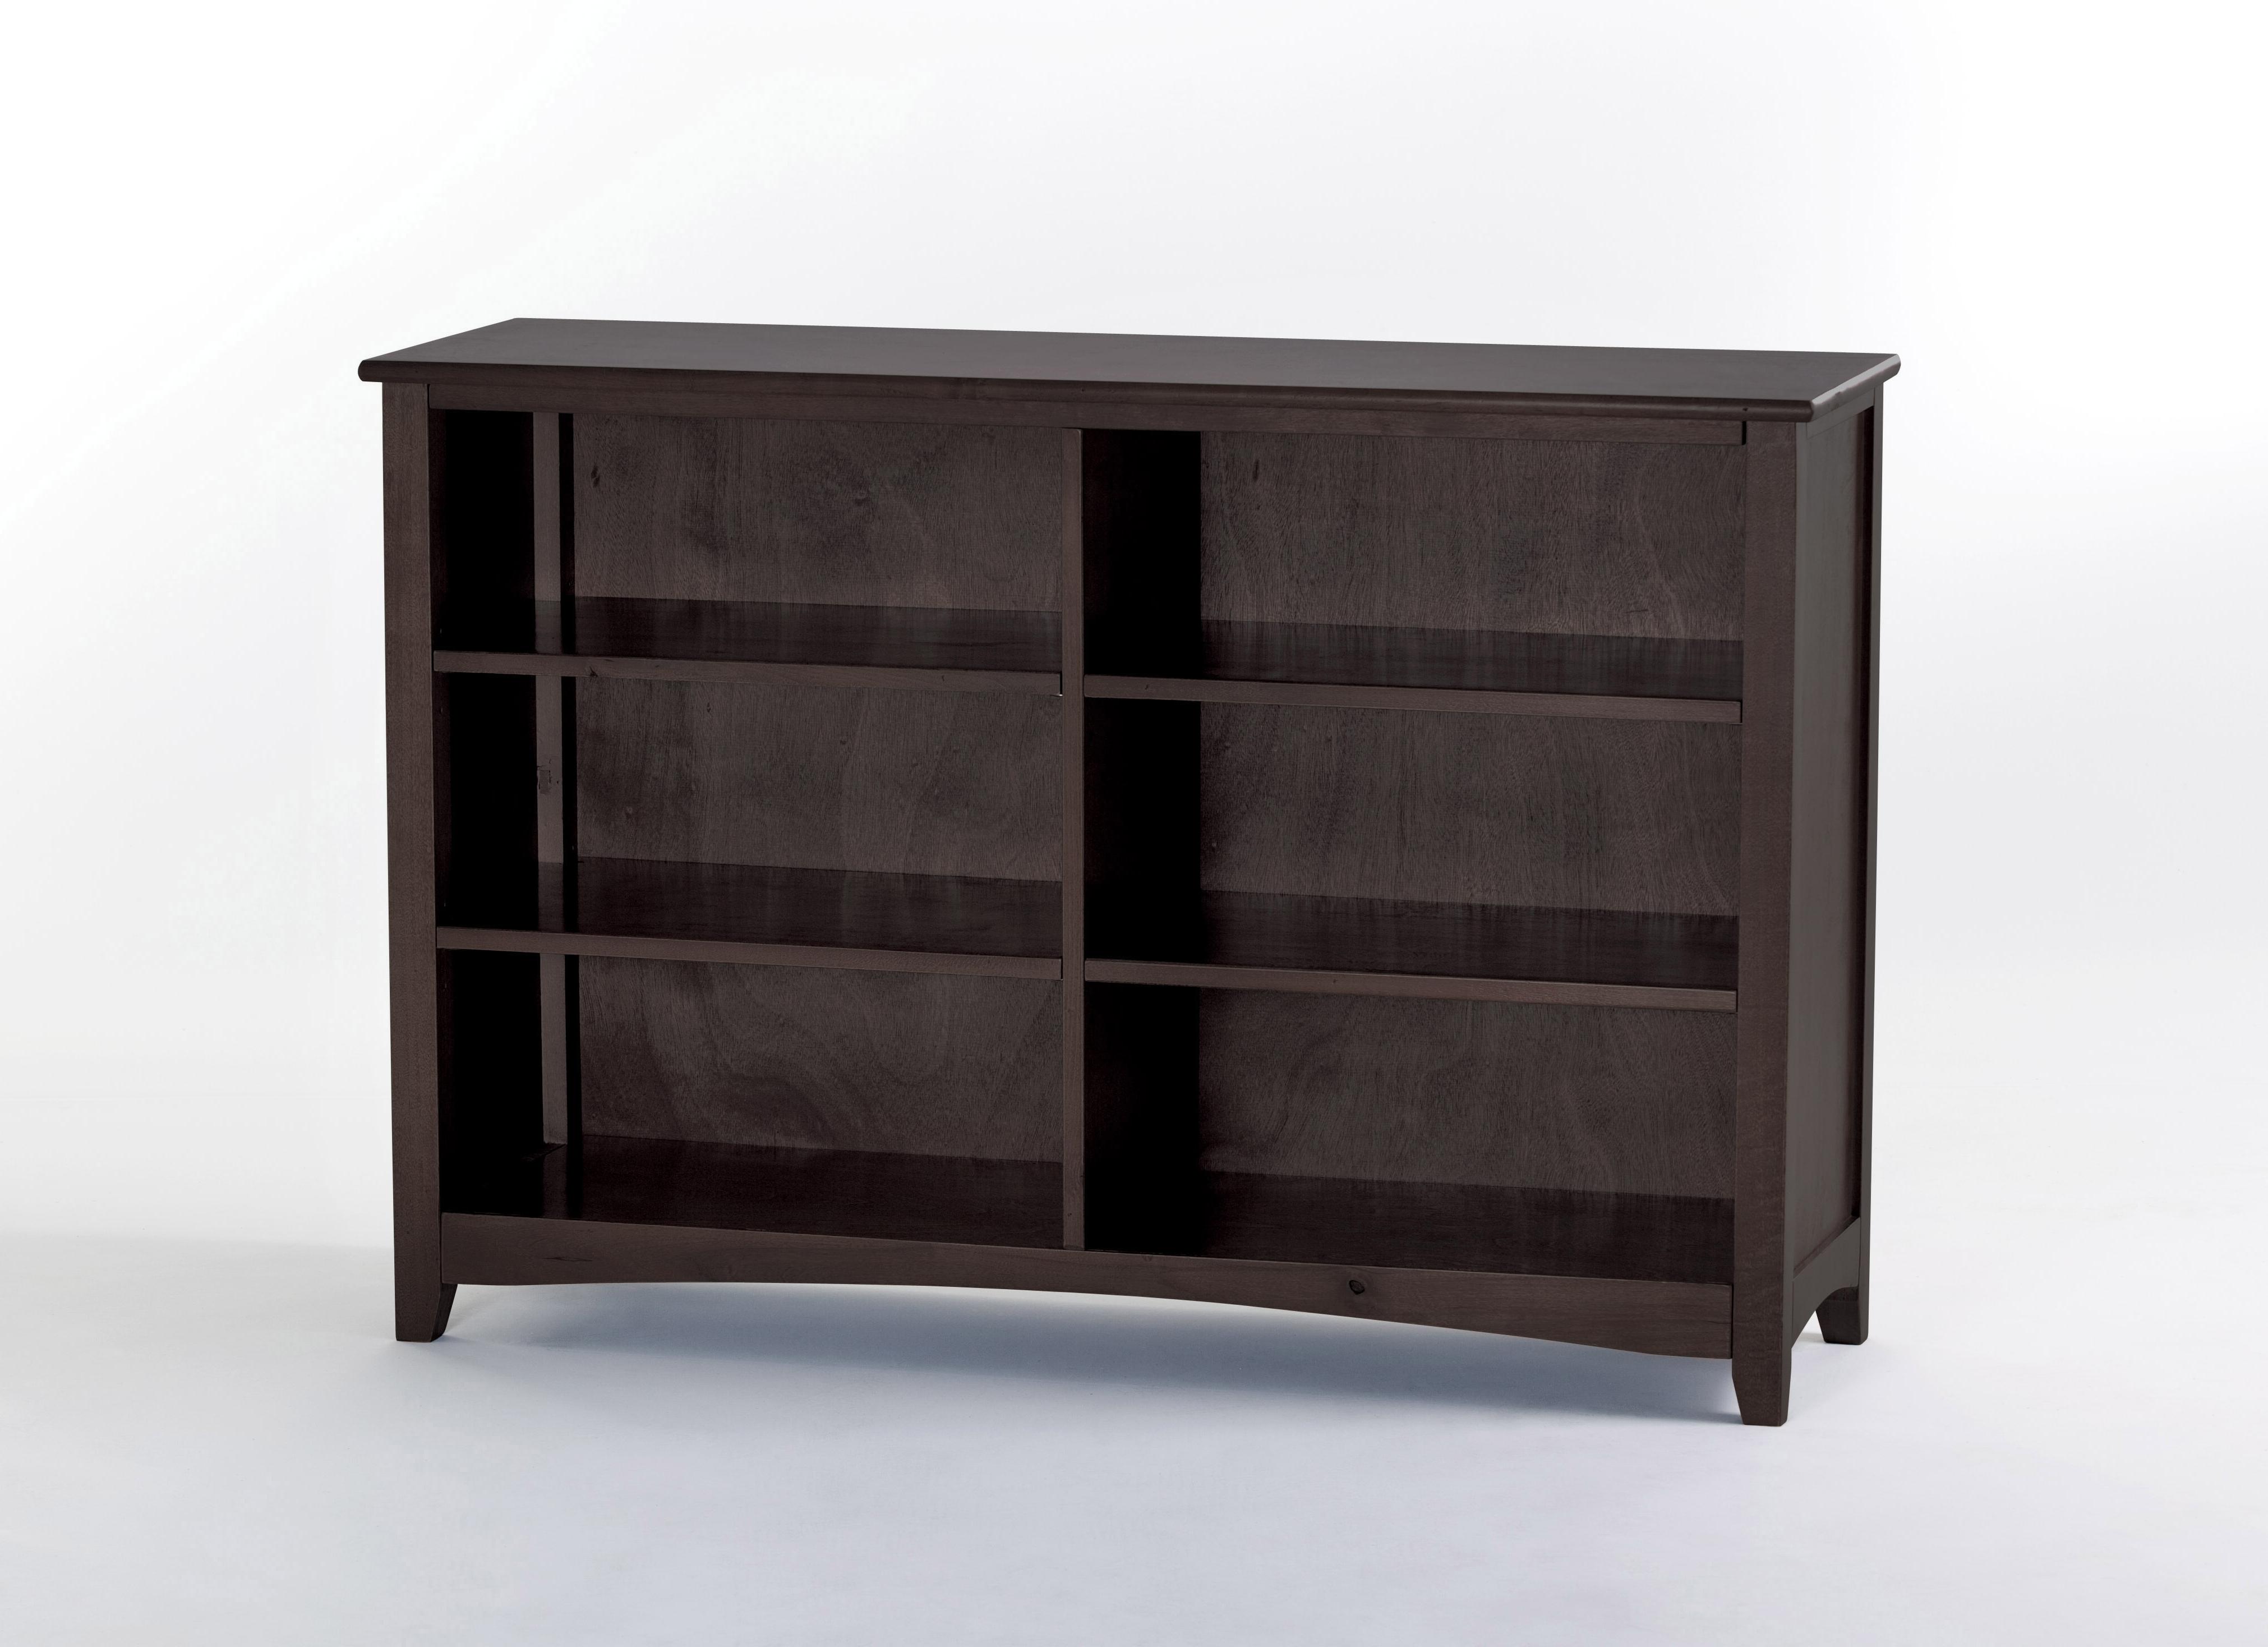 Preferred Ne Kids School House Horizontal Bookcase Throughout Horizontal Bookcases (View 4 of 15)